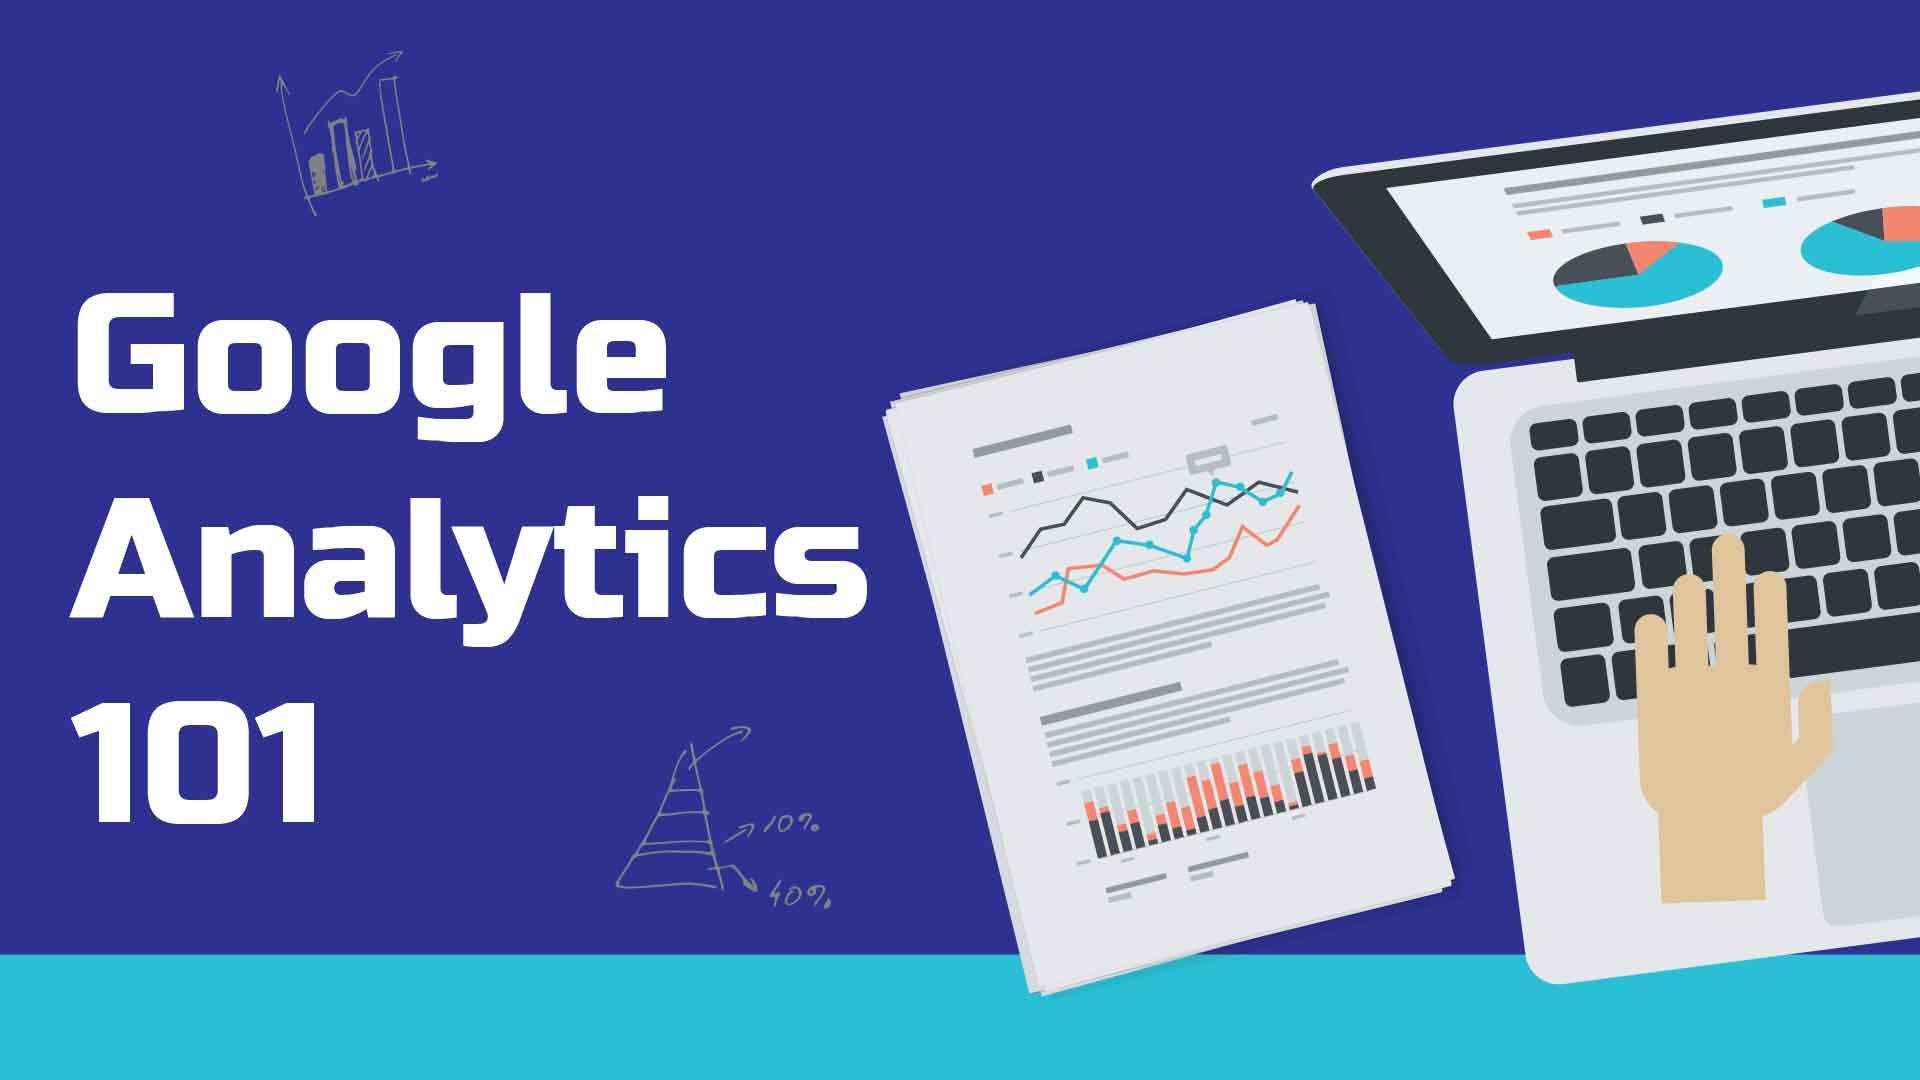 Google-Analytics-101-Facebook-Event